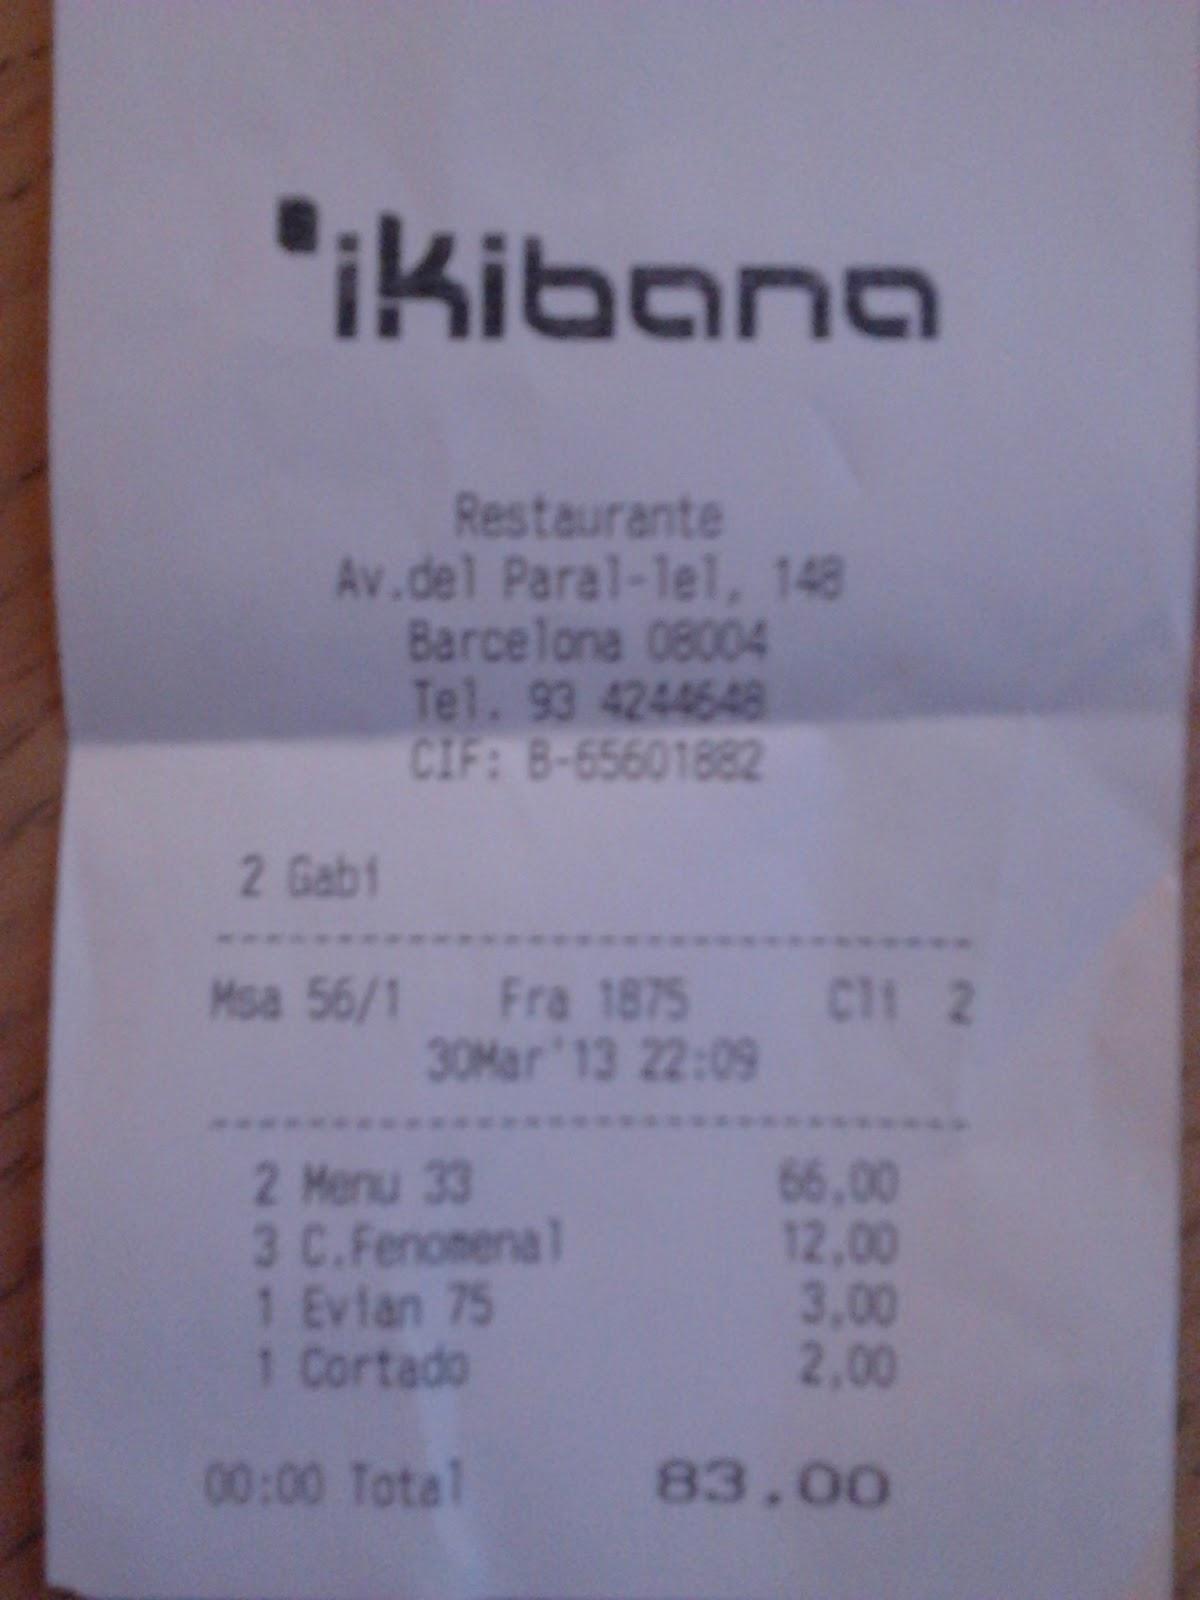 Gastronom a barcelona for Ikibana menu barcelona